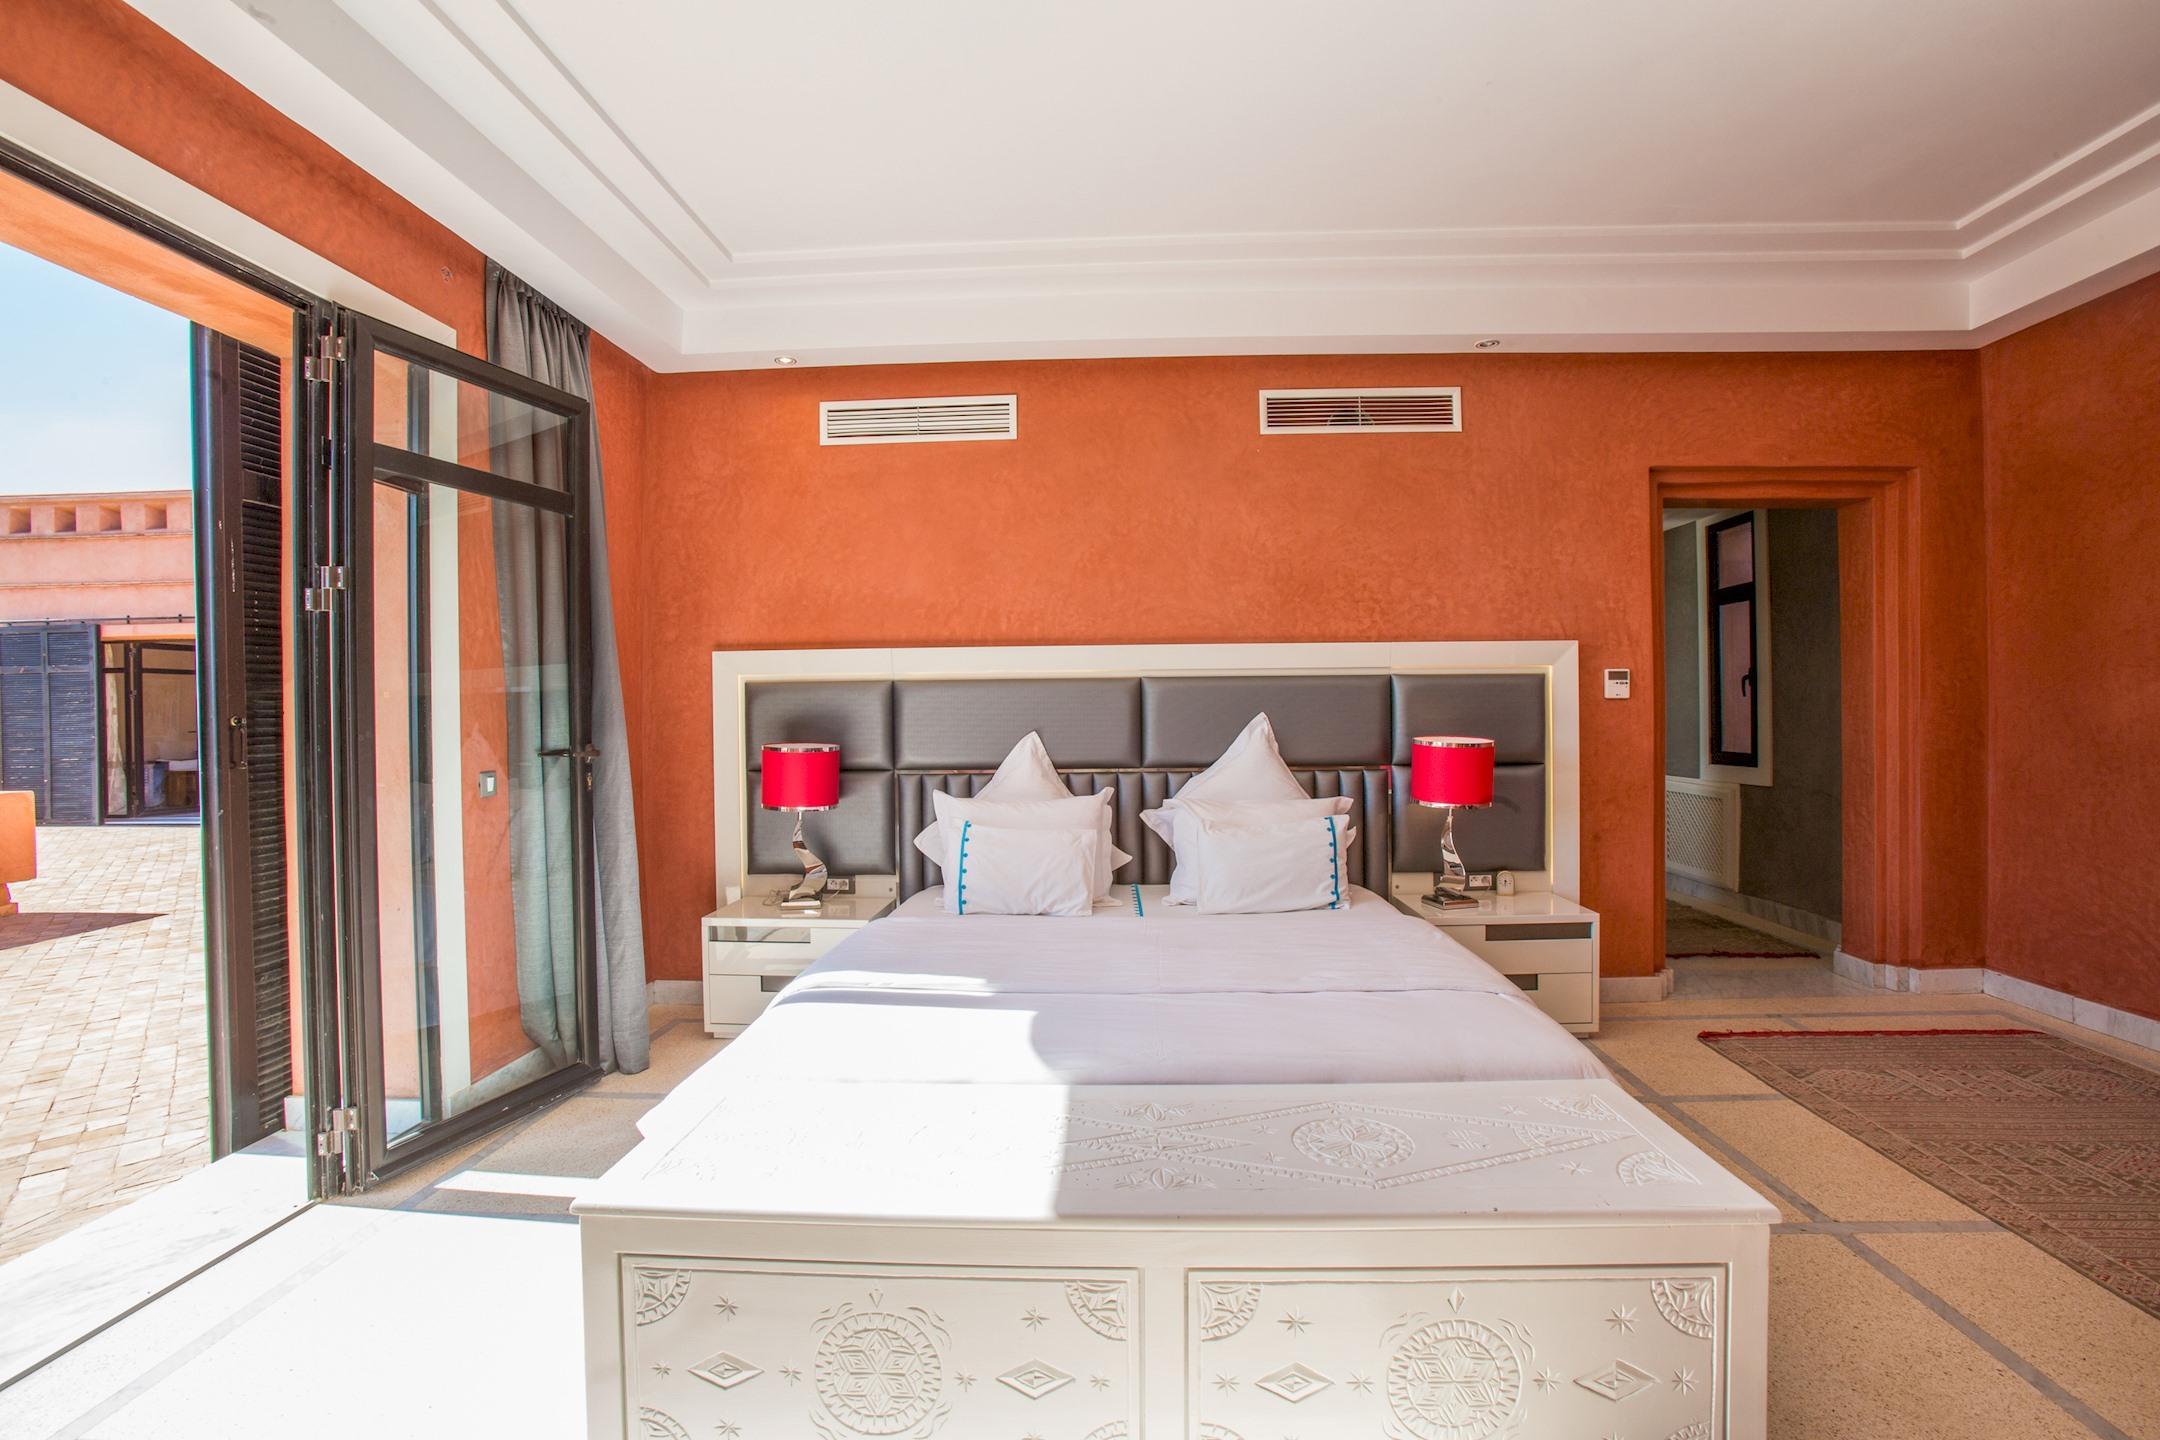 Apartment VILLA KOUTOUBIA - PISCINE CHAUFFEE  HAMMAM  JACUZZI  PETIT-DEJEUNER A MARRAKECH photo 20444598